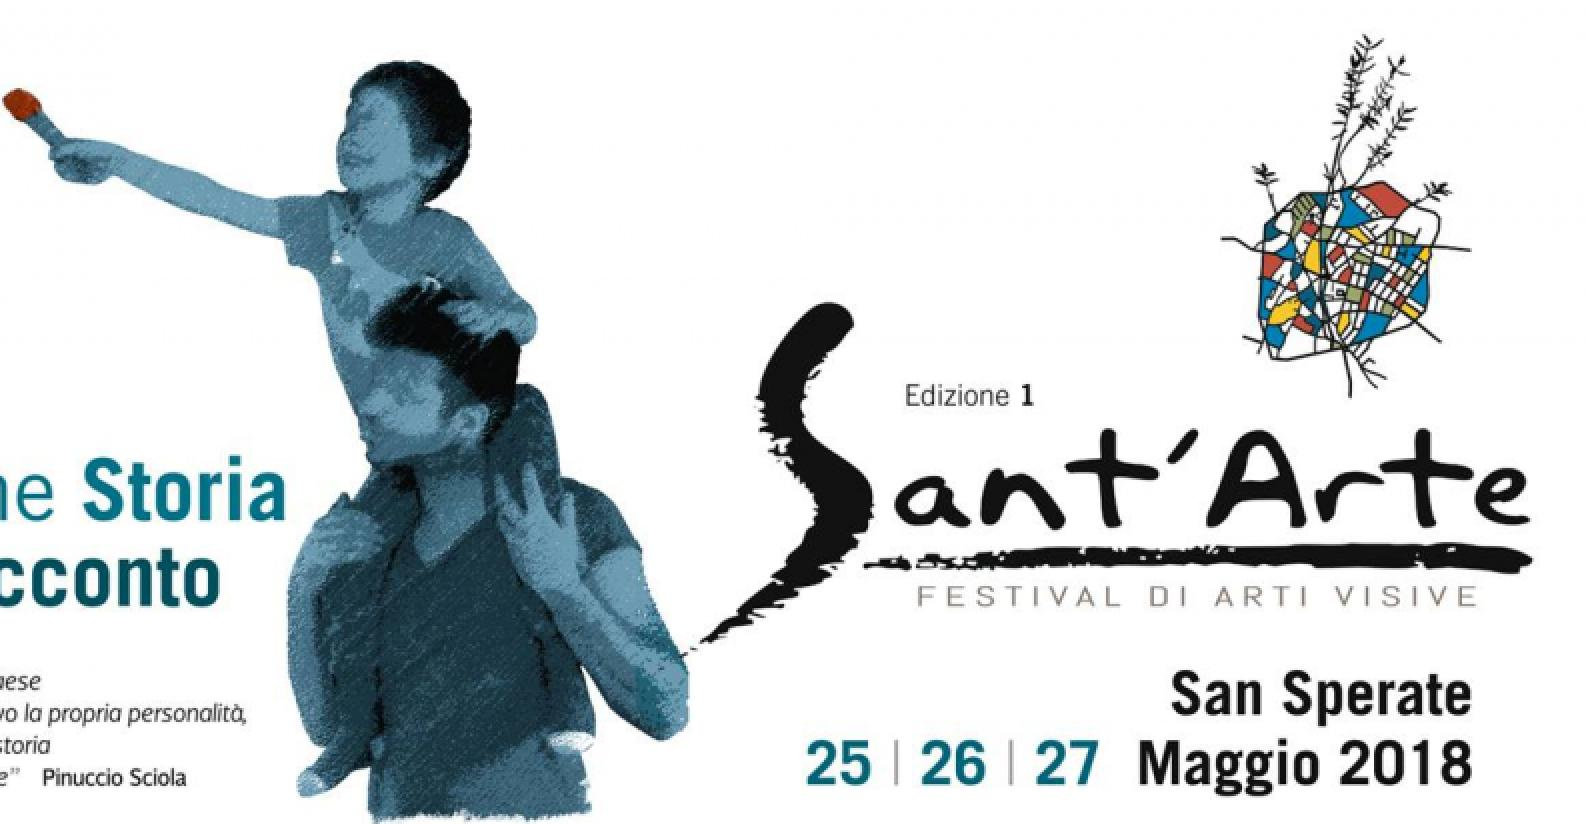 Sant'Arte 2018 (locandina)